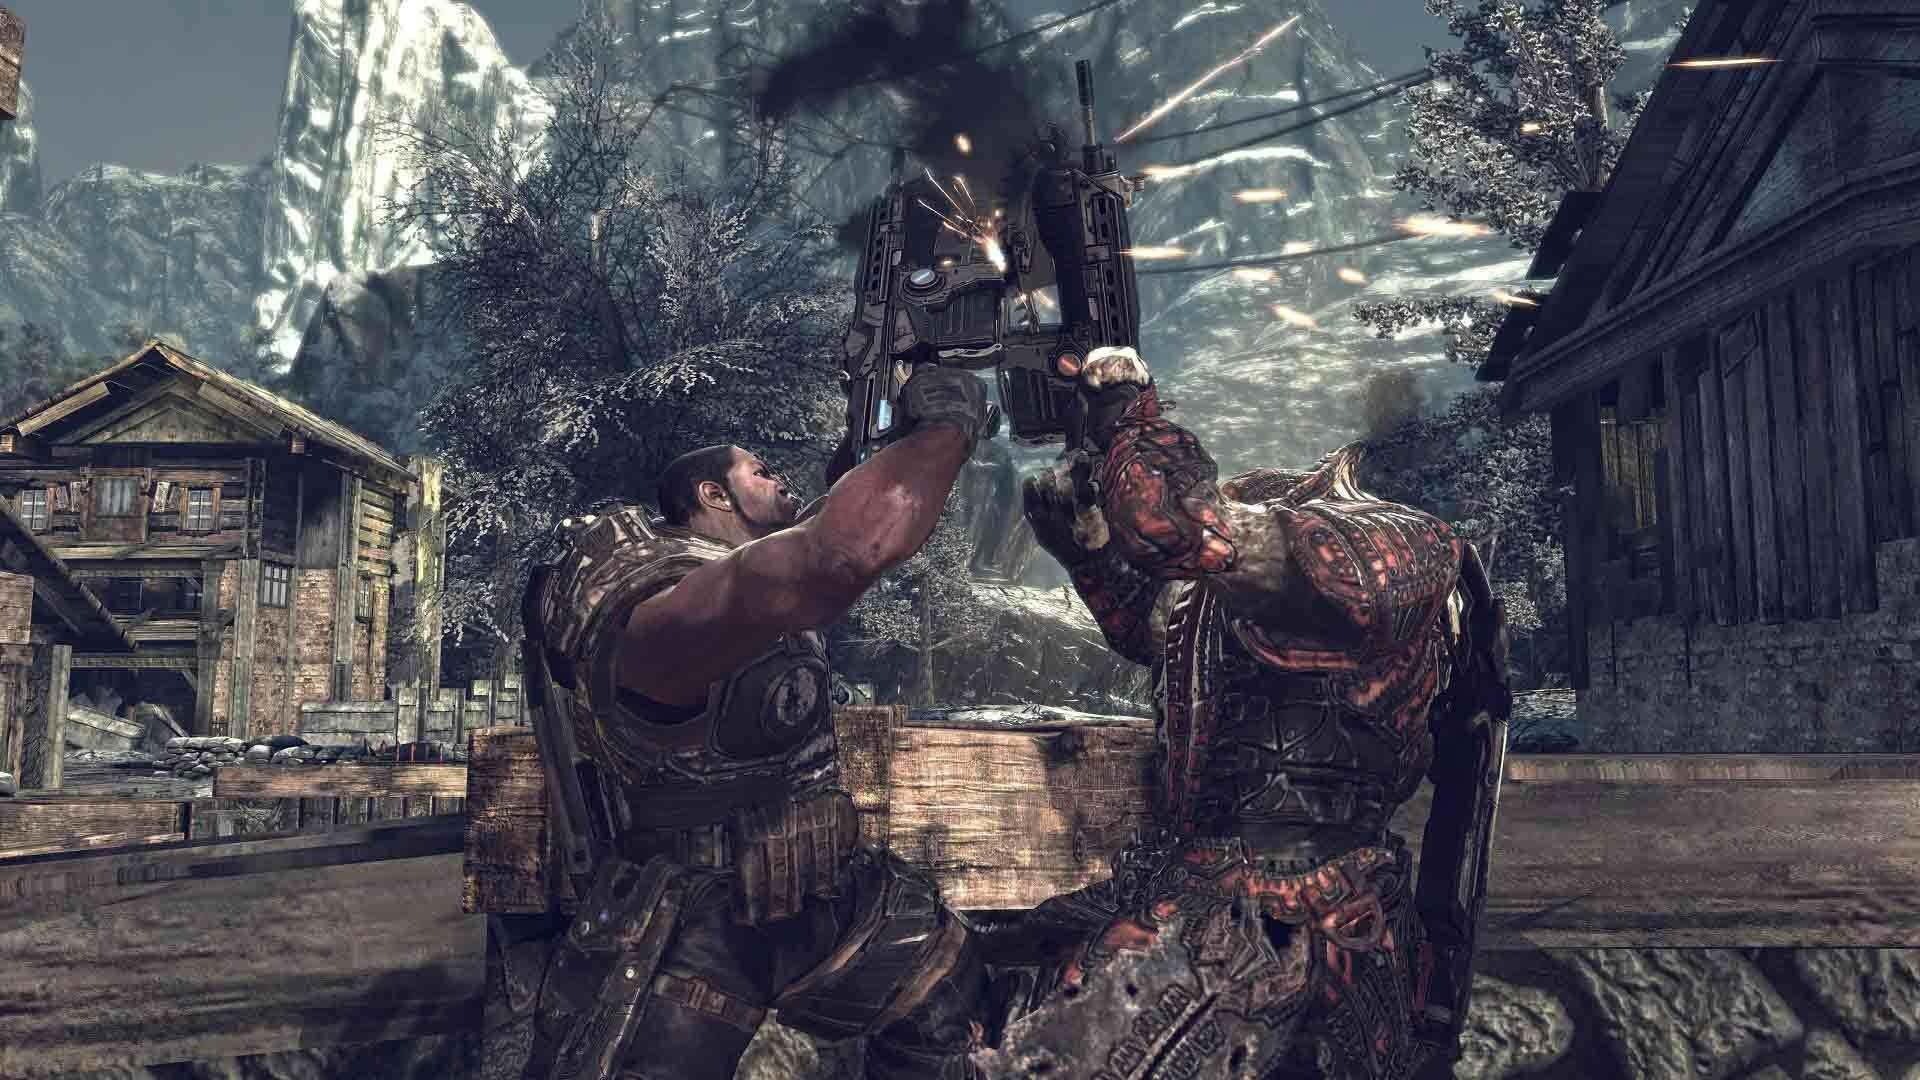 'Gears of War 4' Trailer Gave Disturbed Frontman Chills | Inverse